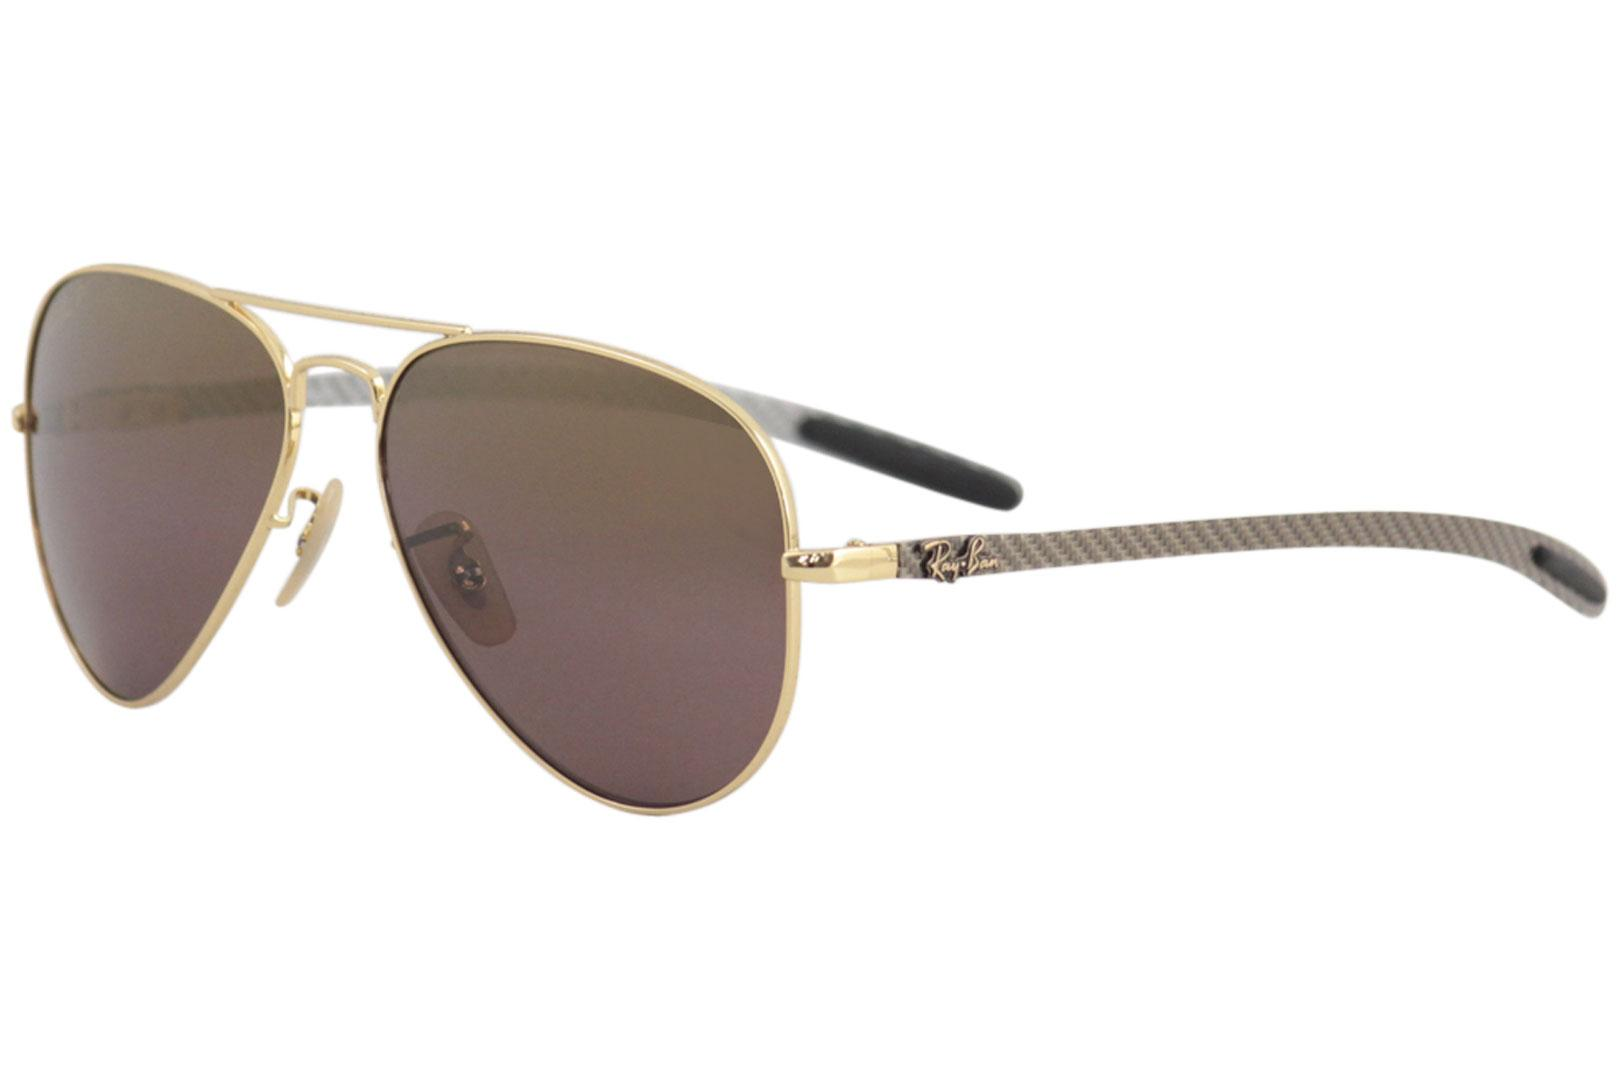 39c4532cb6ae8c Ray Ban Men s Chromance RB8317CH RB 8317 CH Pilot RayBan Polarized  Sunglasses